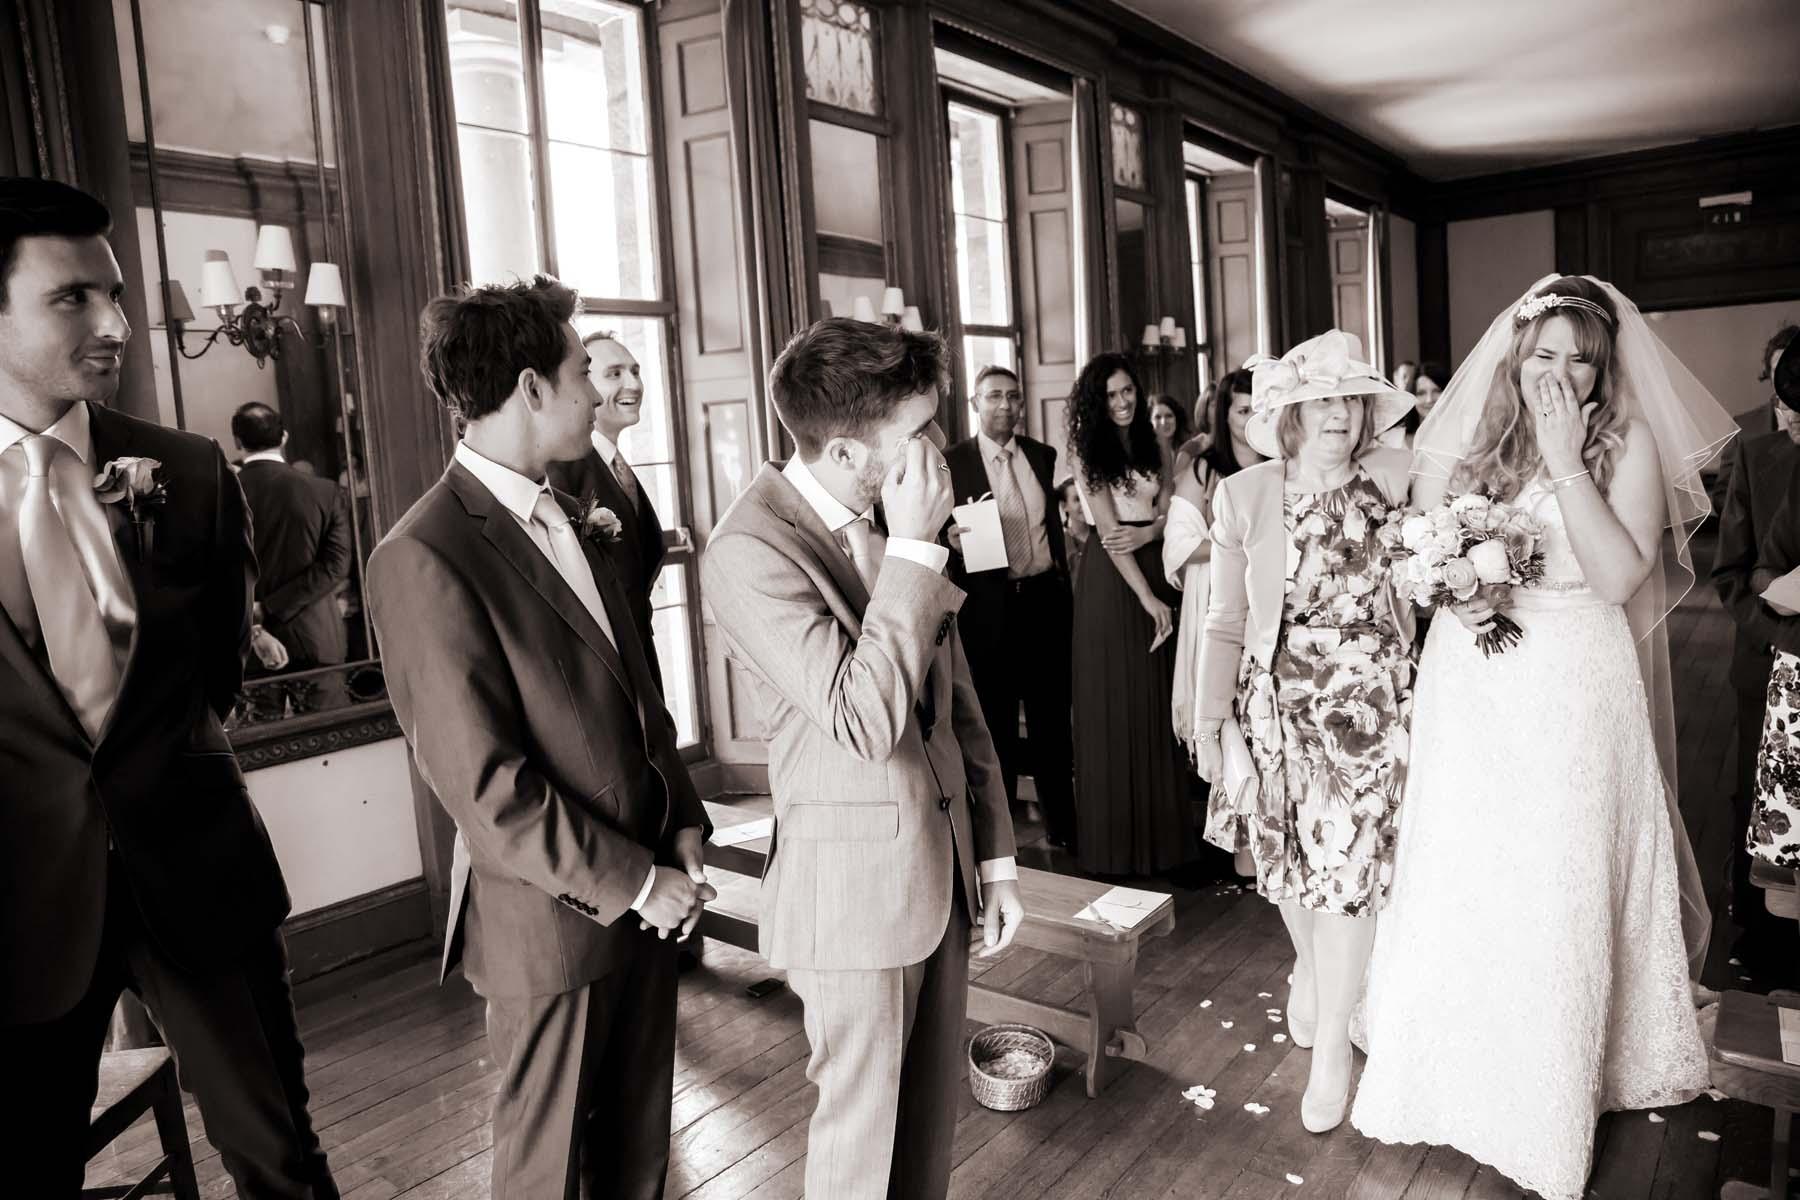 Sussex & Surrey Wedding Photographer - Ceremony (2)